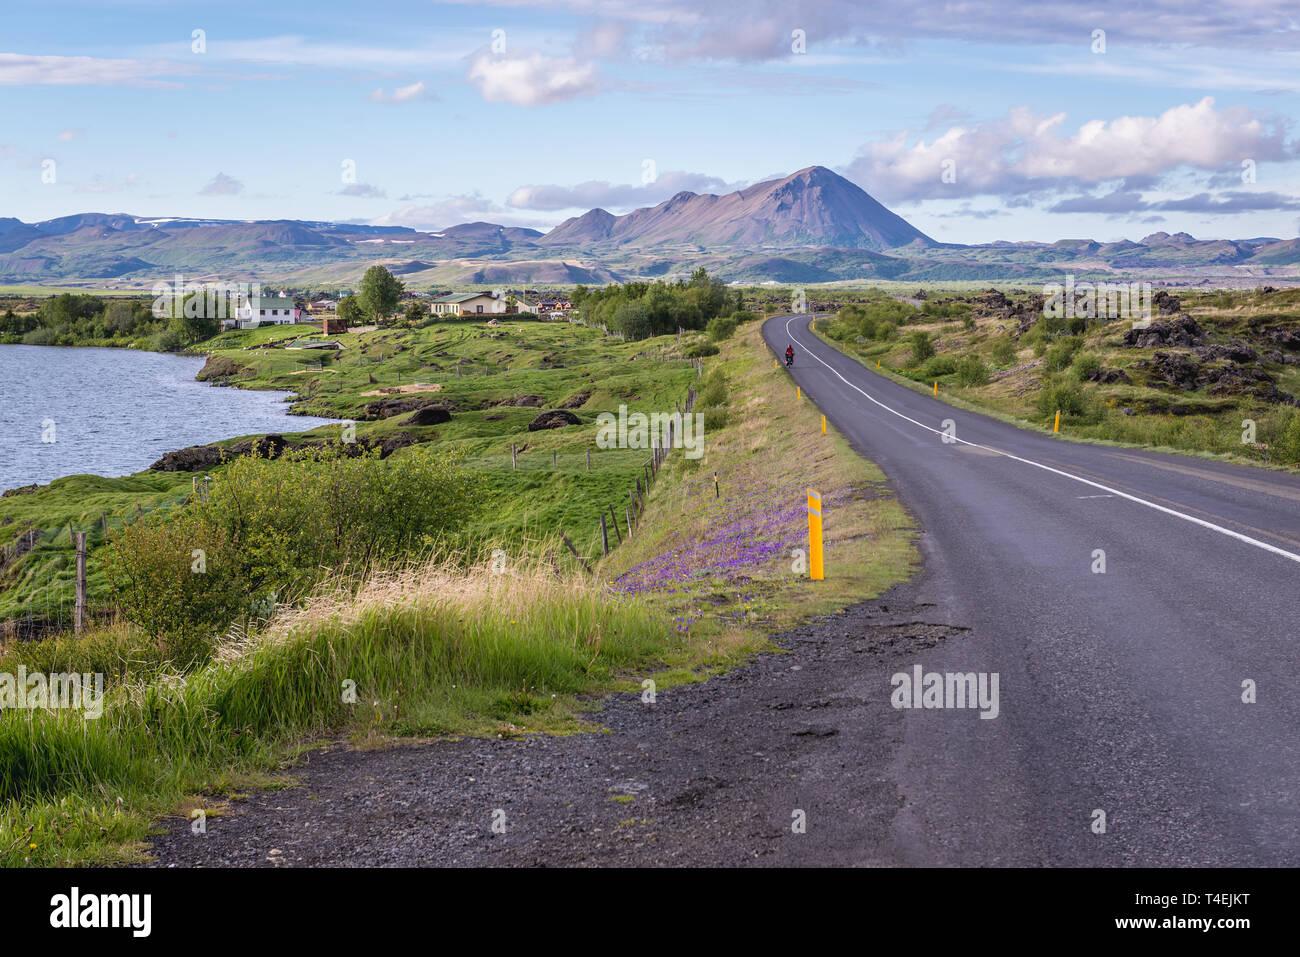 Road 848 along Lake Myvatn near Reykjahlid village in Iceland - Stock Image